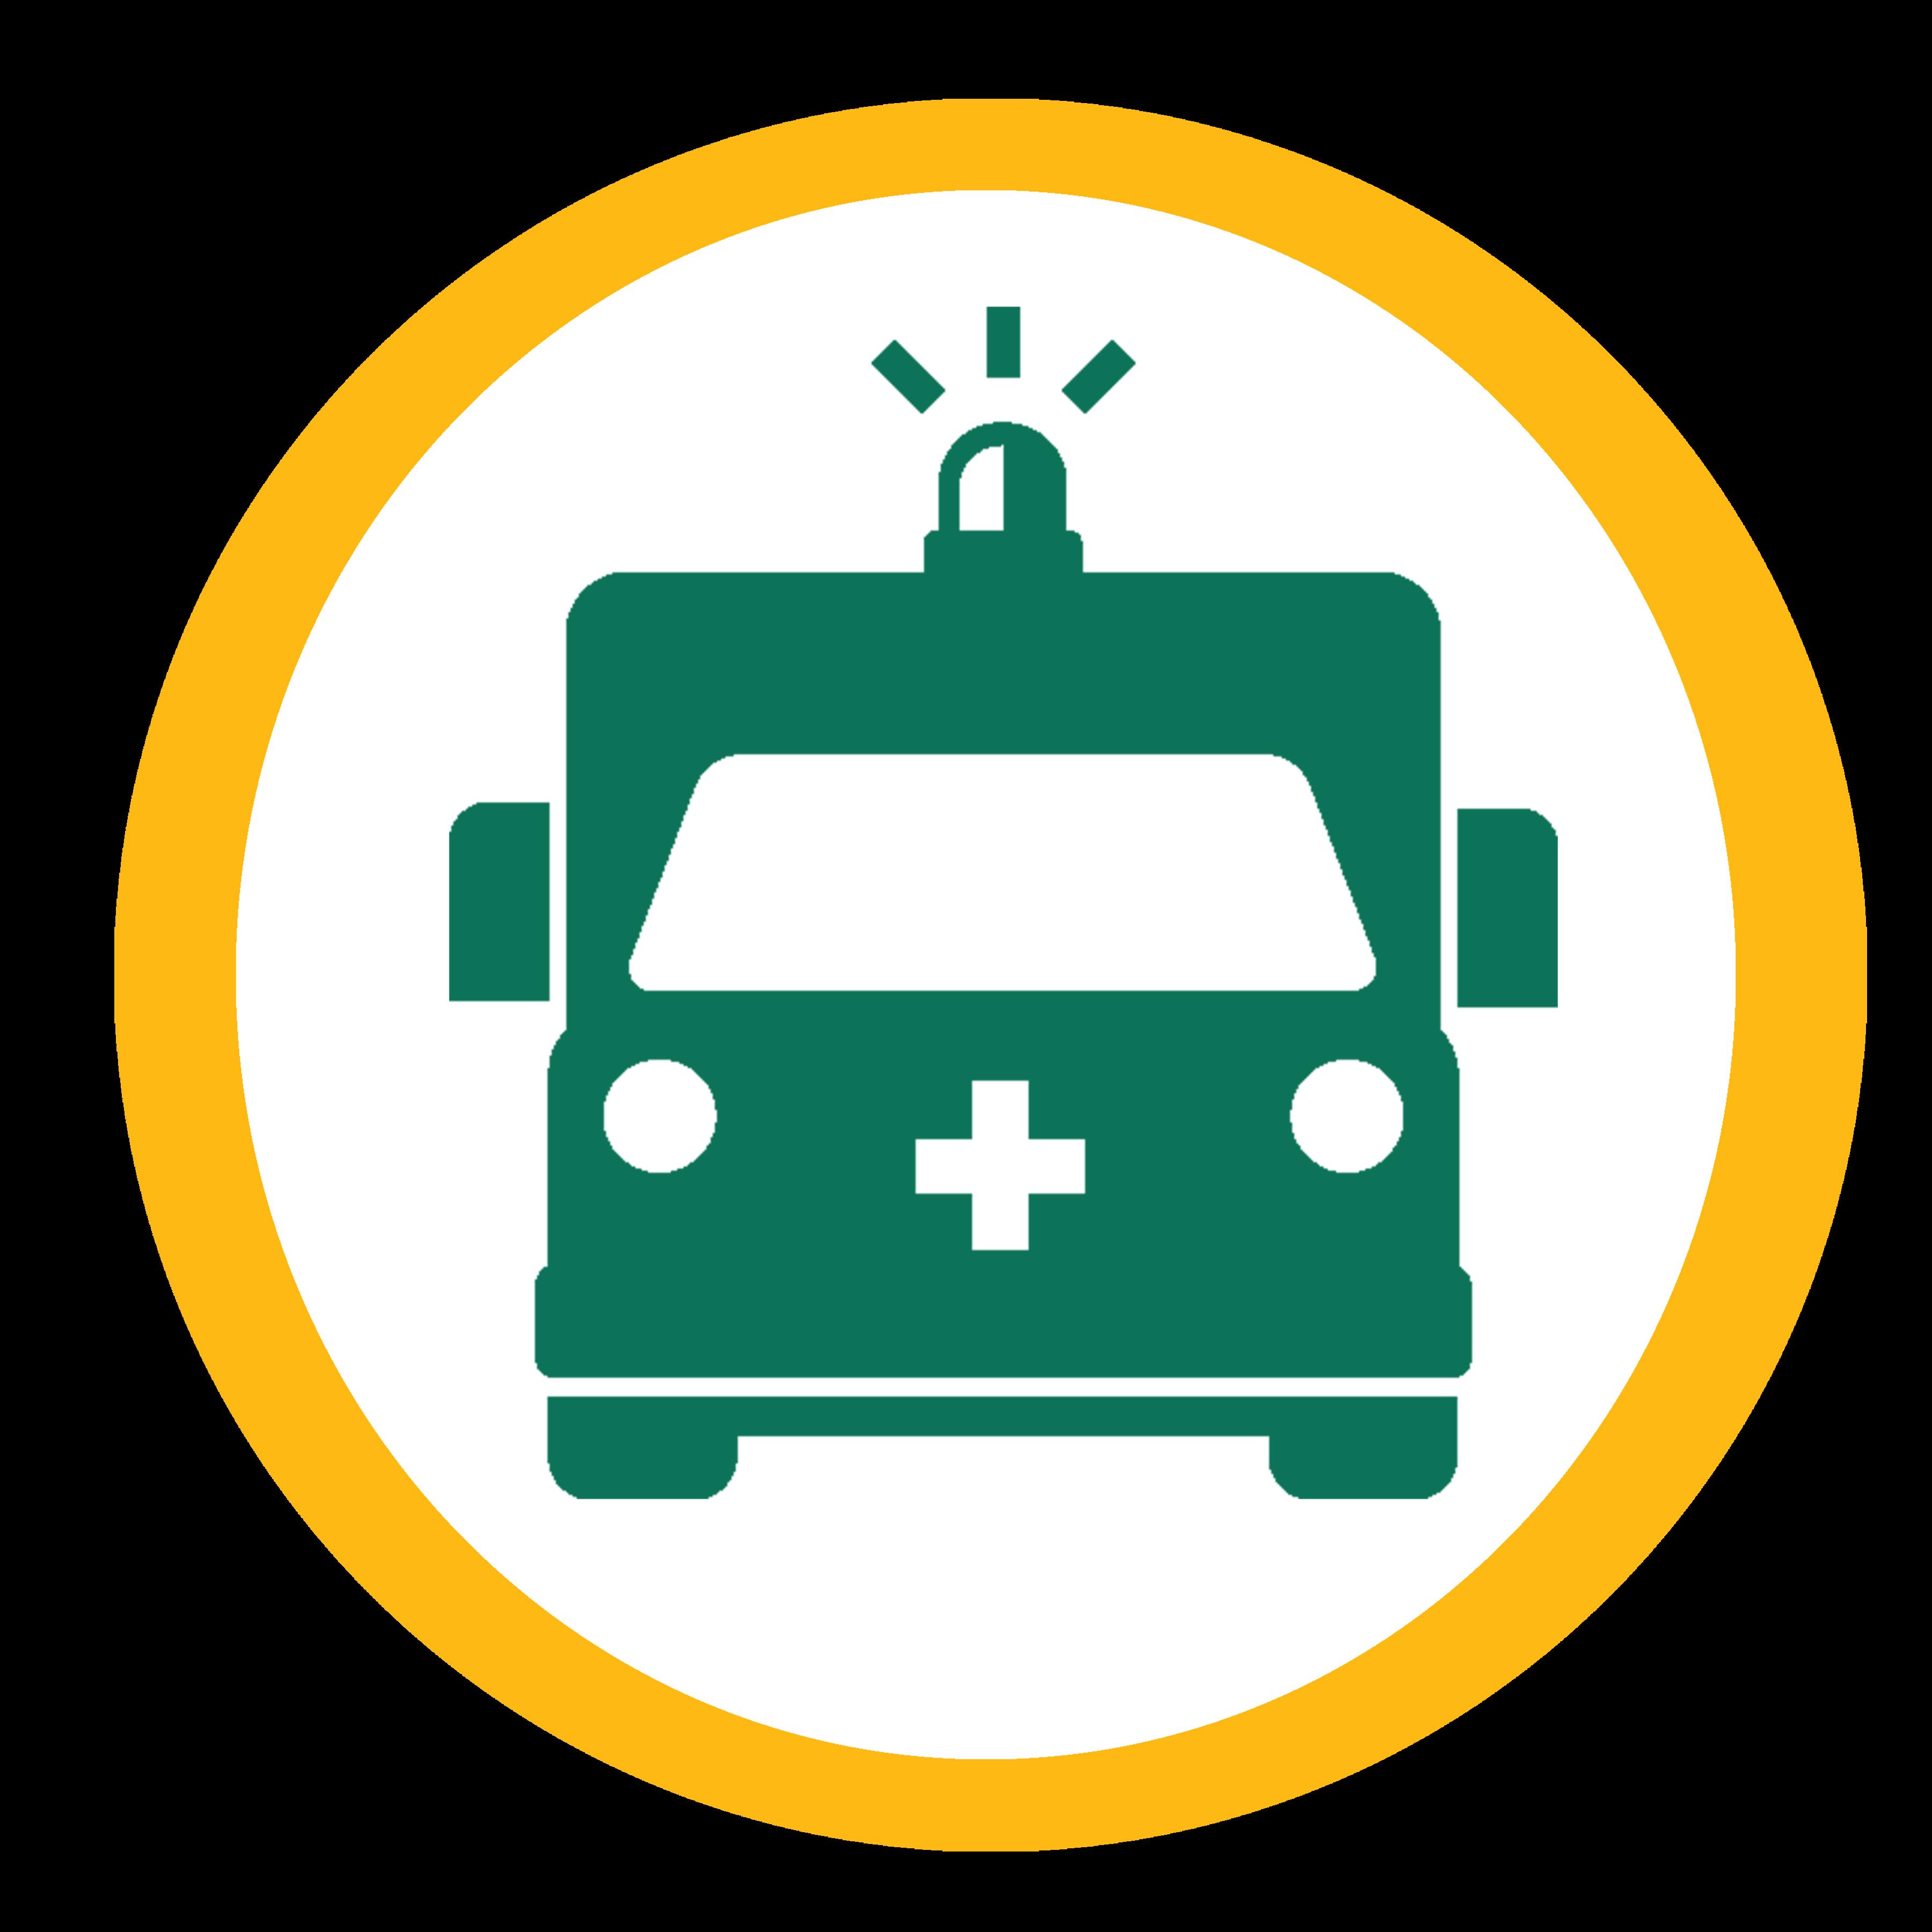 jpg transparent library ambulance